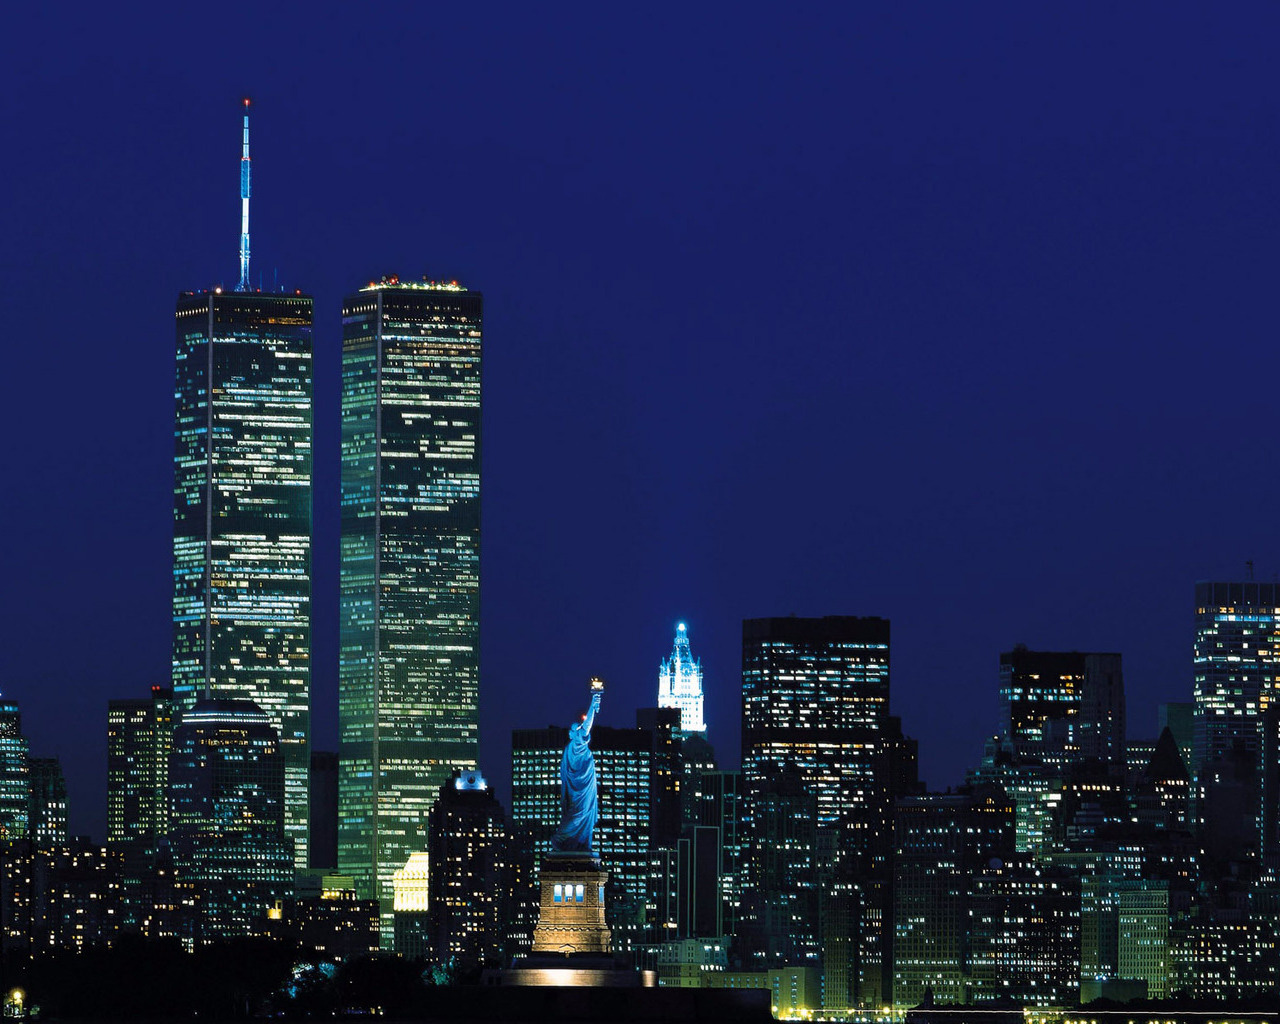 New York Night Wallpaper 1280x1024